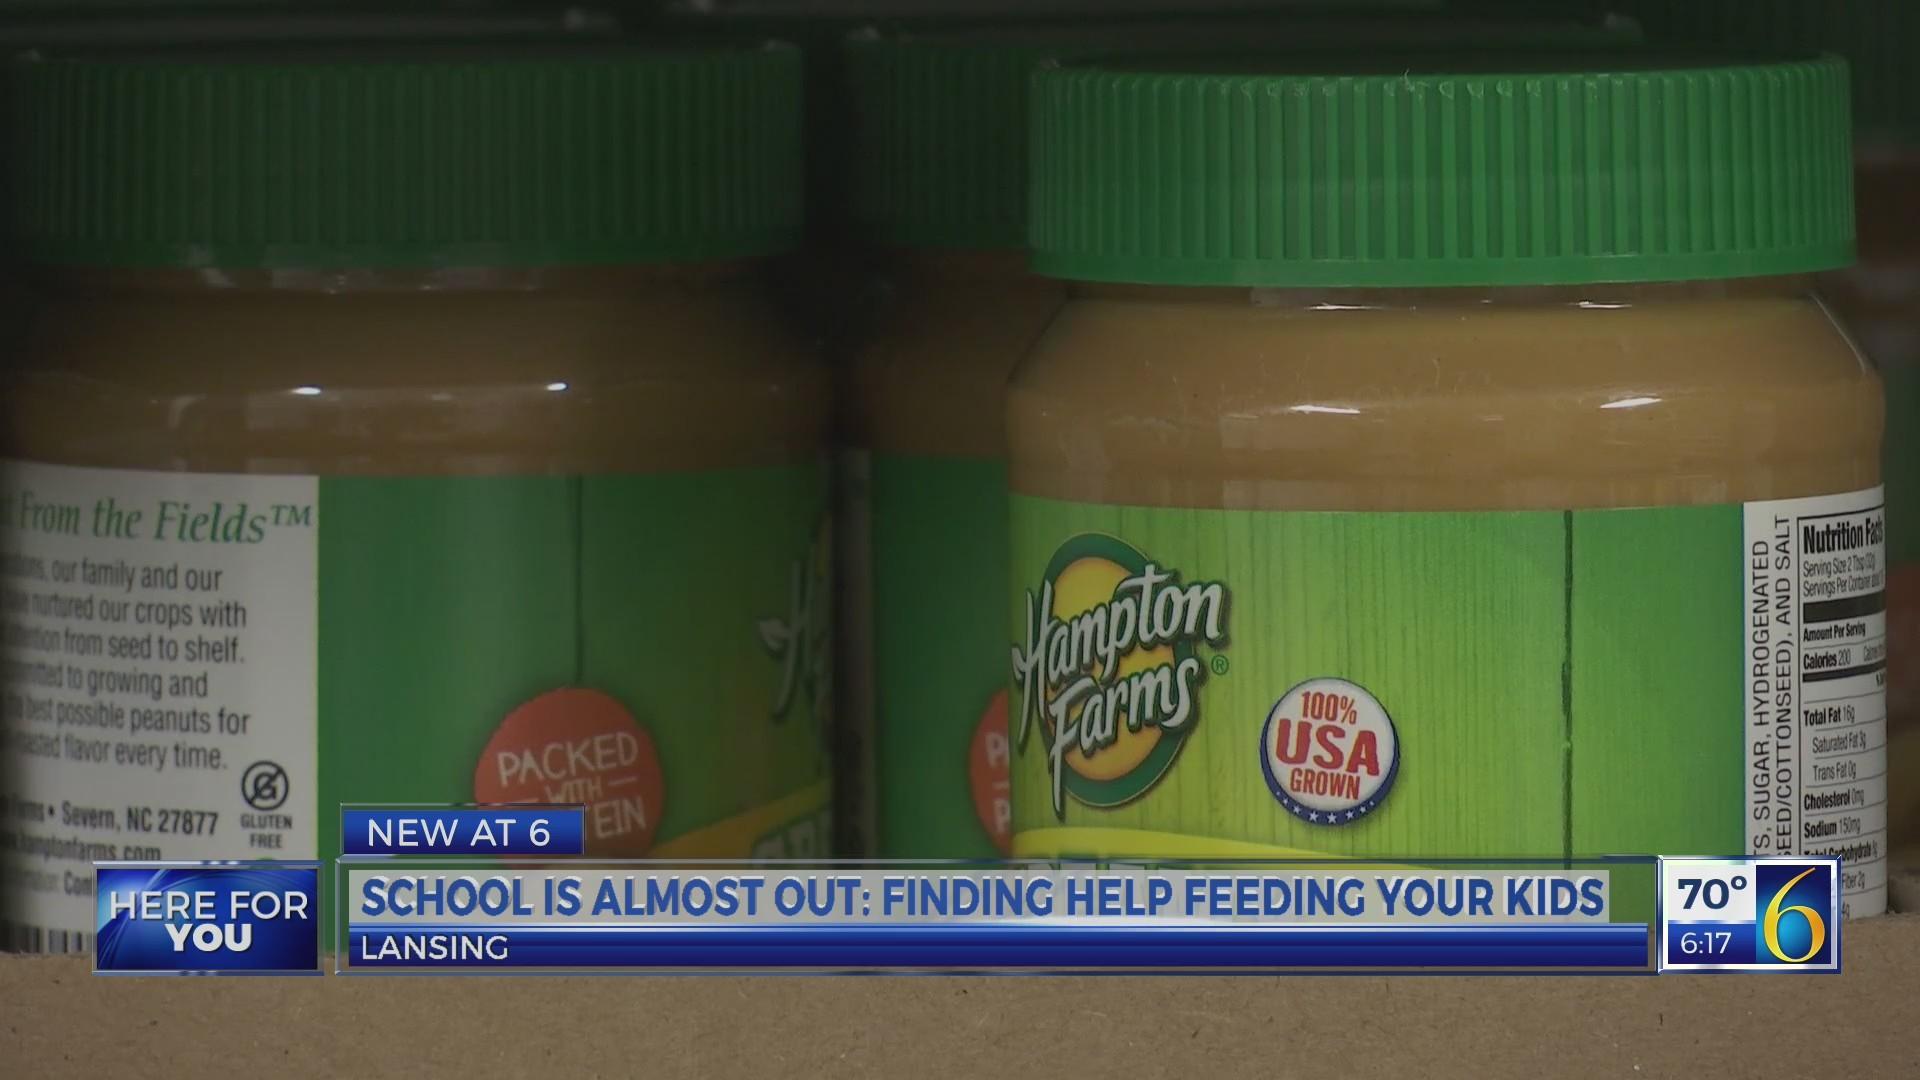 Finding help feeding kids